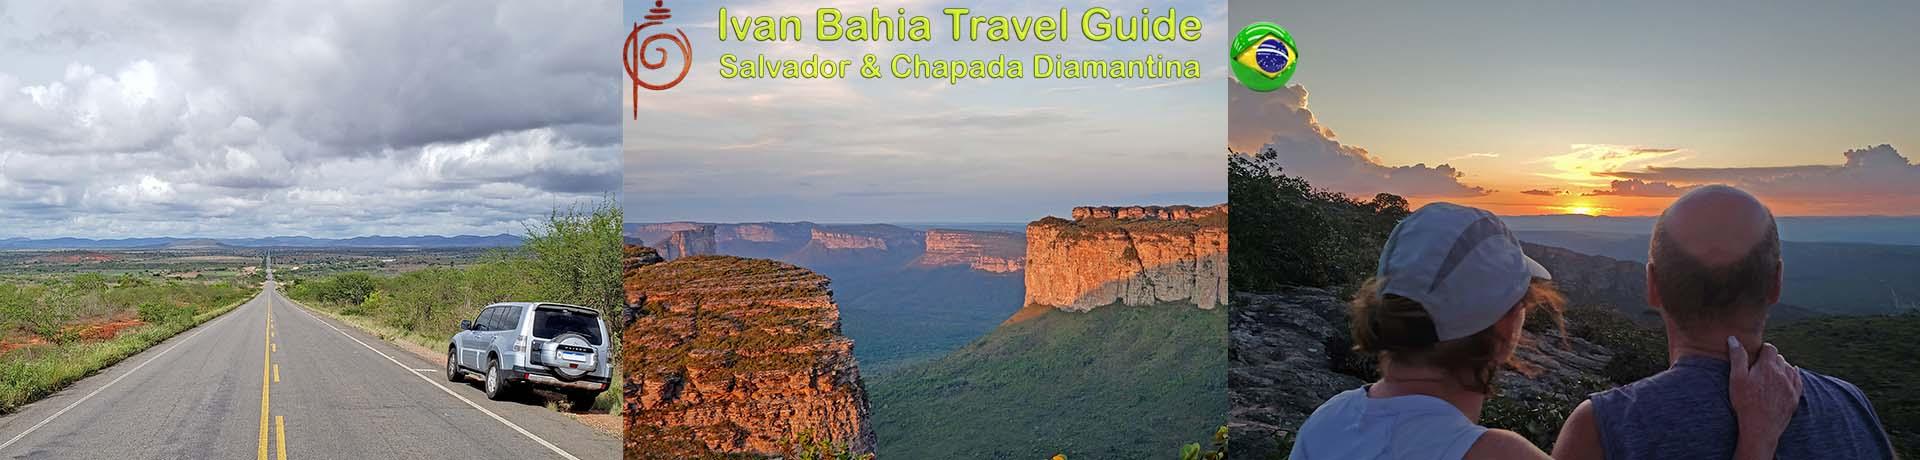 Ivan Bahia Nederlandstalig reis gids privé reis Salvador & nationaal park Chapada Diamantina (ook bekend als de 'Grand Canyon van Brazilië') - reizen met een Vlaming - hashtag #ibtg #ibg #ivanbahiaguide #ivanbahiatravelguide #zenturturismo #ivanchapadadiamantinaguide #valedopati #patyvalley #pati #viapati #valecapao #ivanchapadaguide #chapadadiamantinatransfer #chapadatrekking #chapadaroots #chapadasoul #lencoisbahia #chapadadiamantinatrekking #ivanchapadadiamantinaguide  #chapadadiamantinaguide  #lencois #lençois #chapadaadventuredaniel #diamondmountains #zentur #chapadaaventure #discoverchapada #chapadadiamond #chapadasoul #diamantinatrip #tripadvisor #ivanbahia #salvadorbahiaTravel #toursbylocals #fotosbahia #bahiafotos #chapadadiamantinanationalpark #yourtoursbrazil #maurotours #bahiatopturismo #bahiapremium #maisbahiaturismo #fernandobingretourguide #cassiturismo